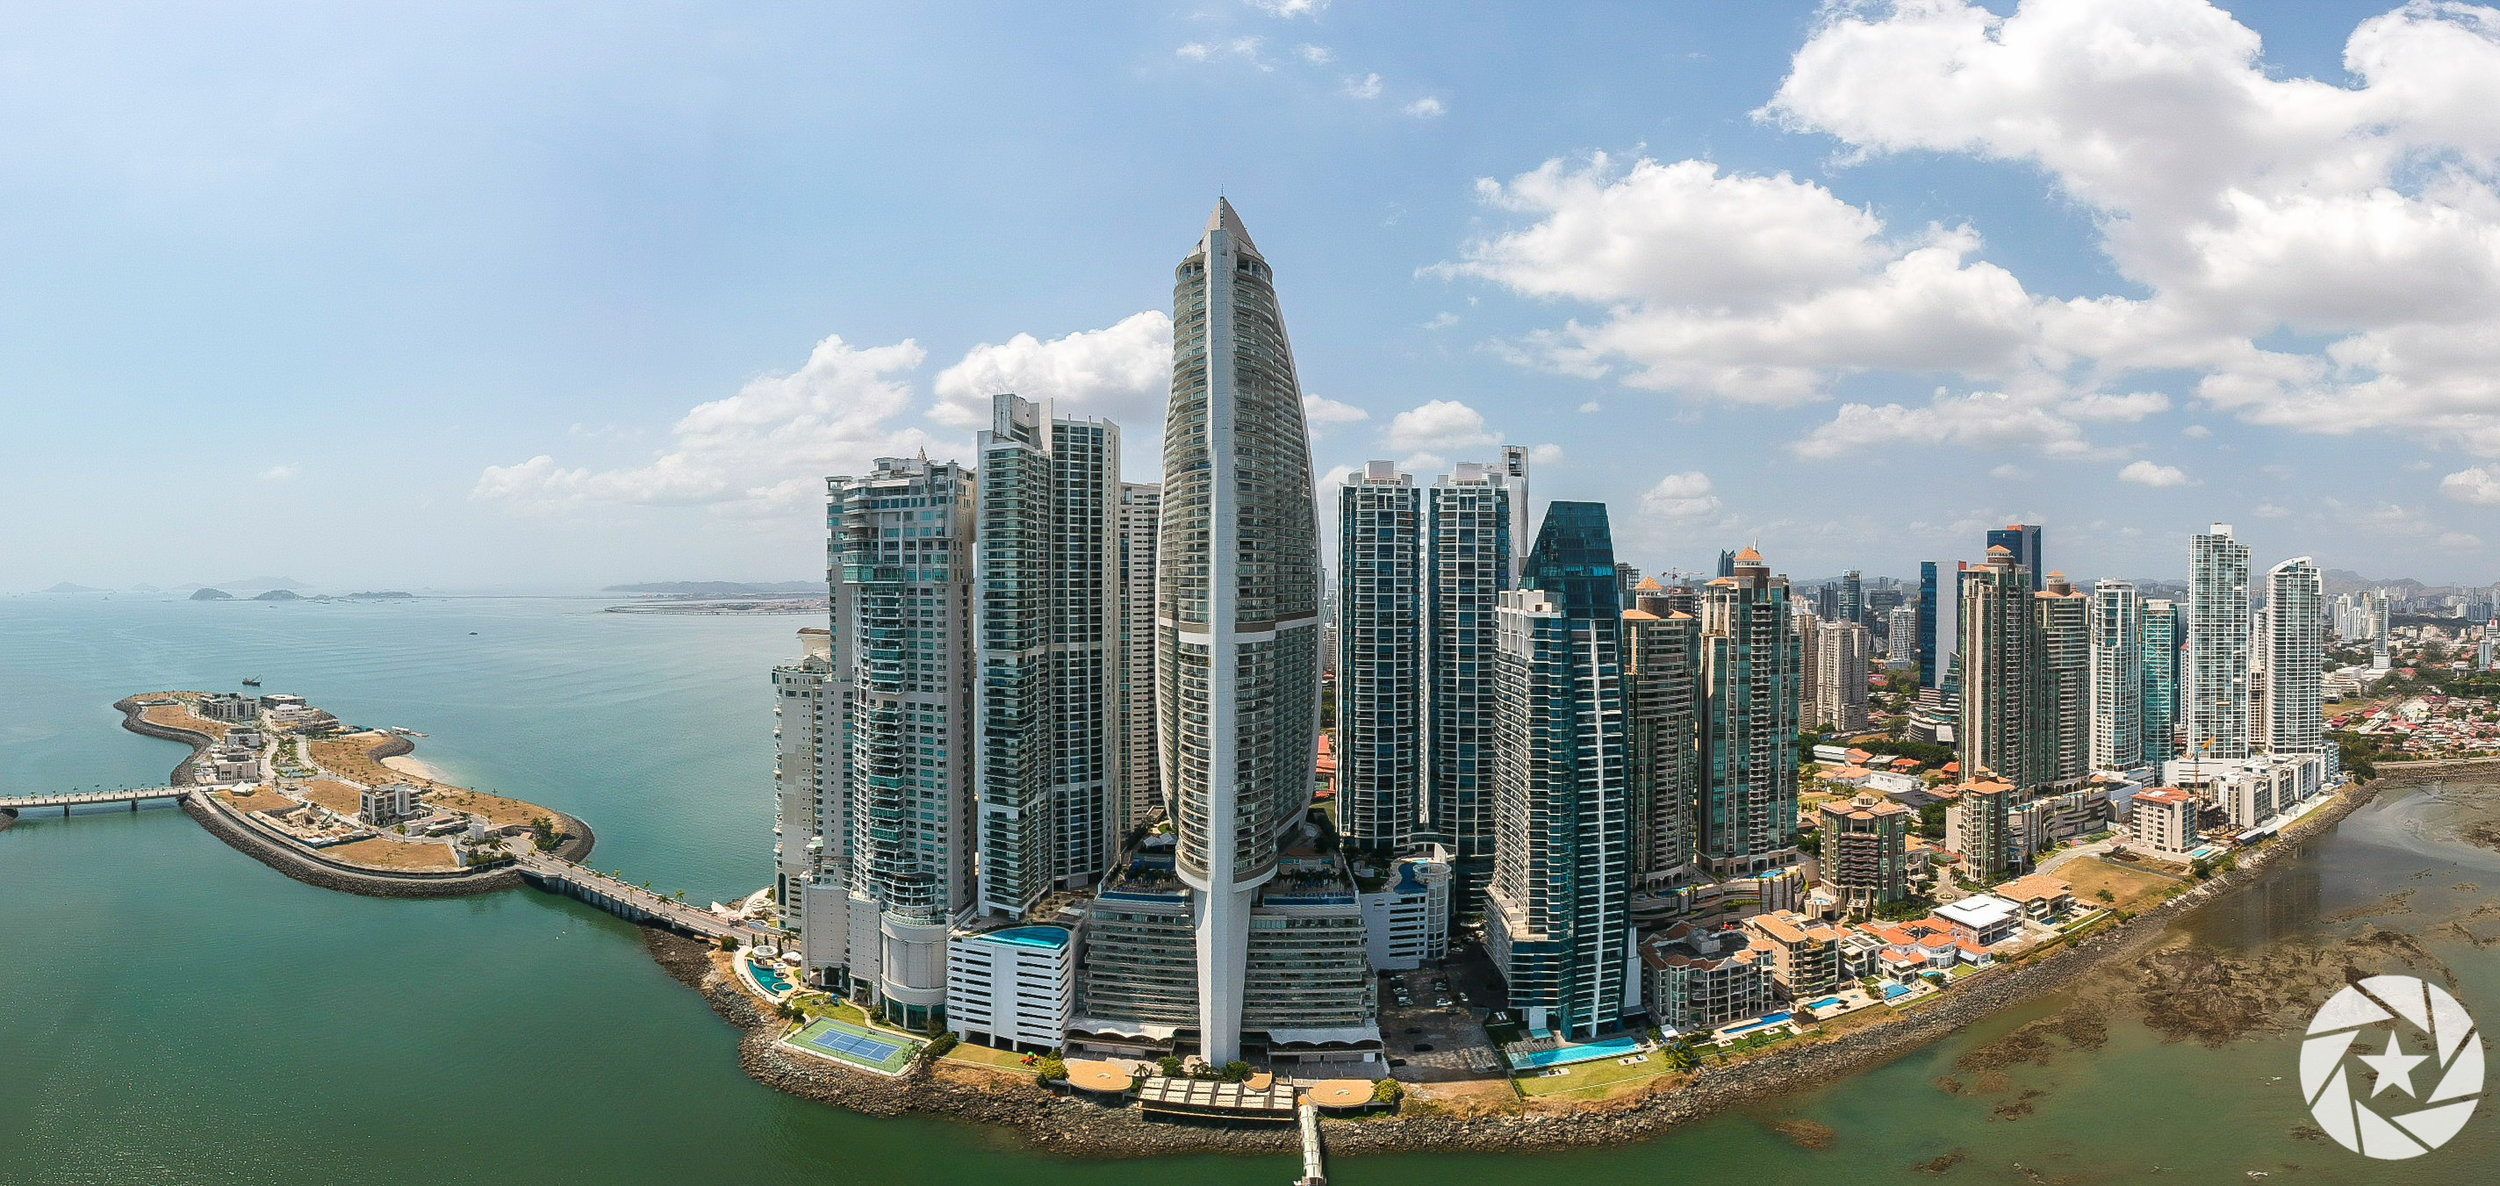 Aerial photo of Trump International Hotel in Panama City